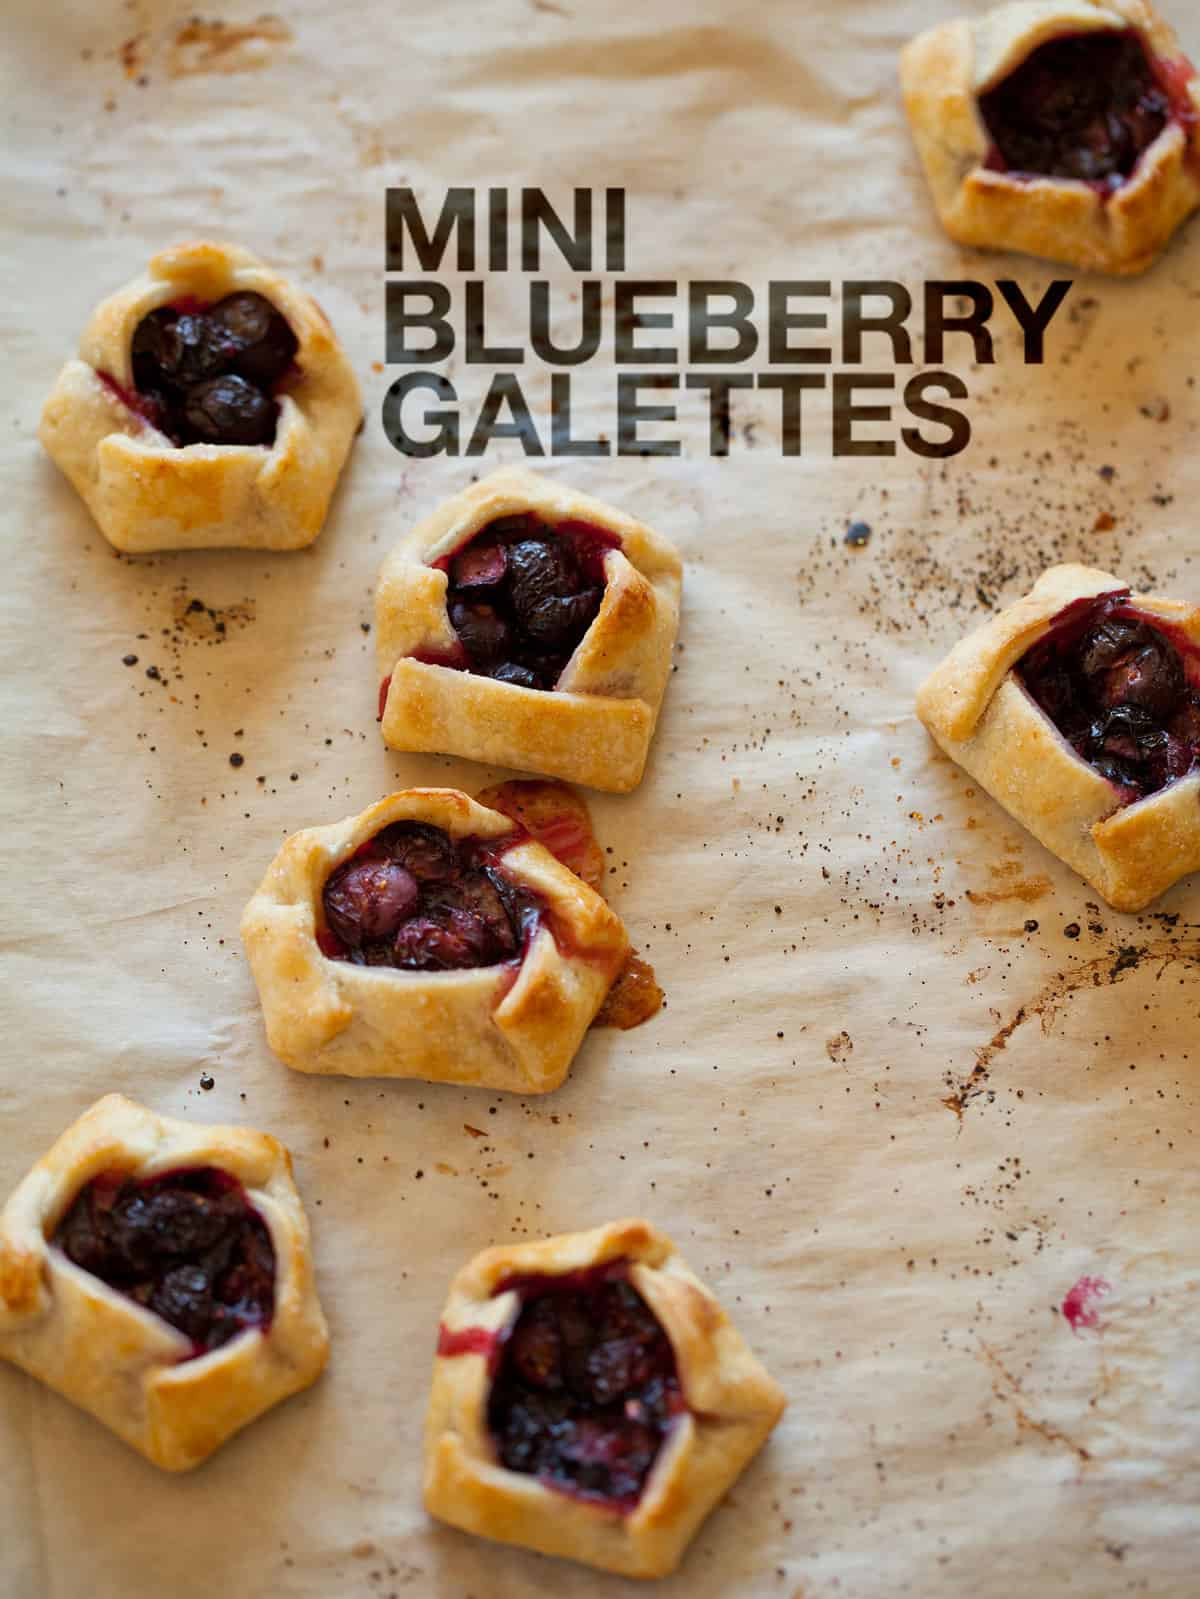 Mini Blueberry Galettes | Dessert recipe | Spoon Fork Bacon